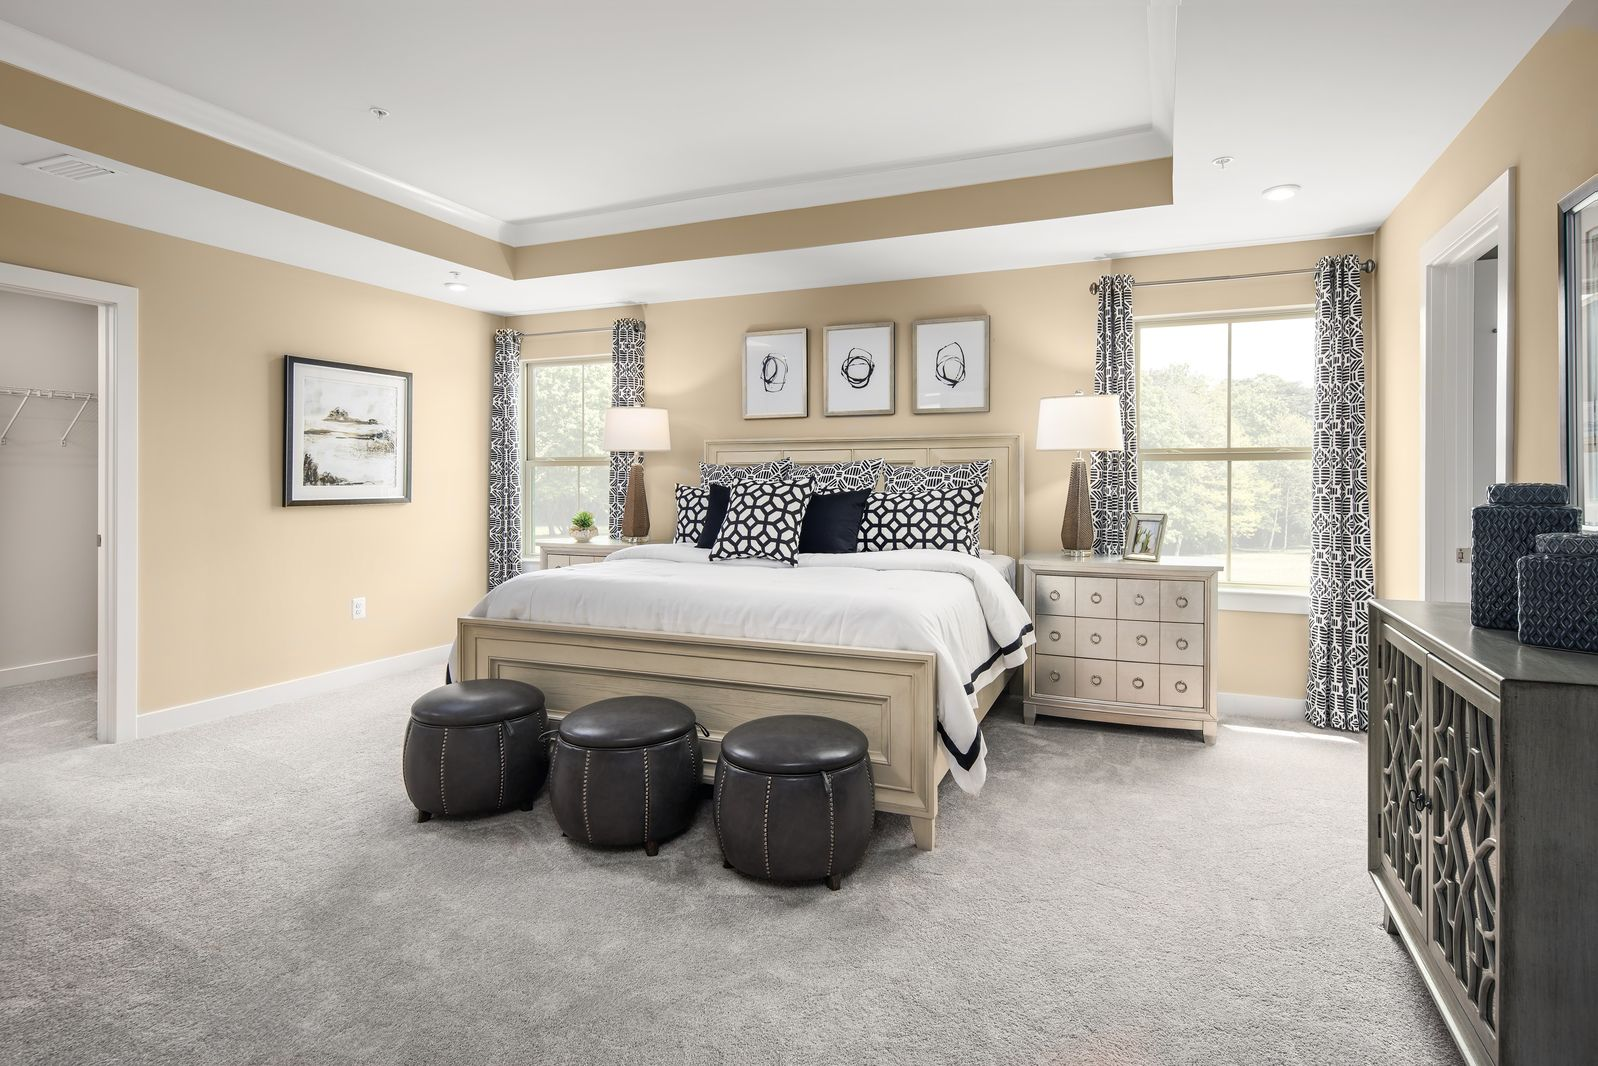 Bedroom featured in the Roanoke By Ryan Homes in Ocean City, MD